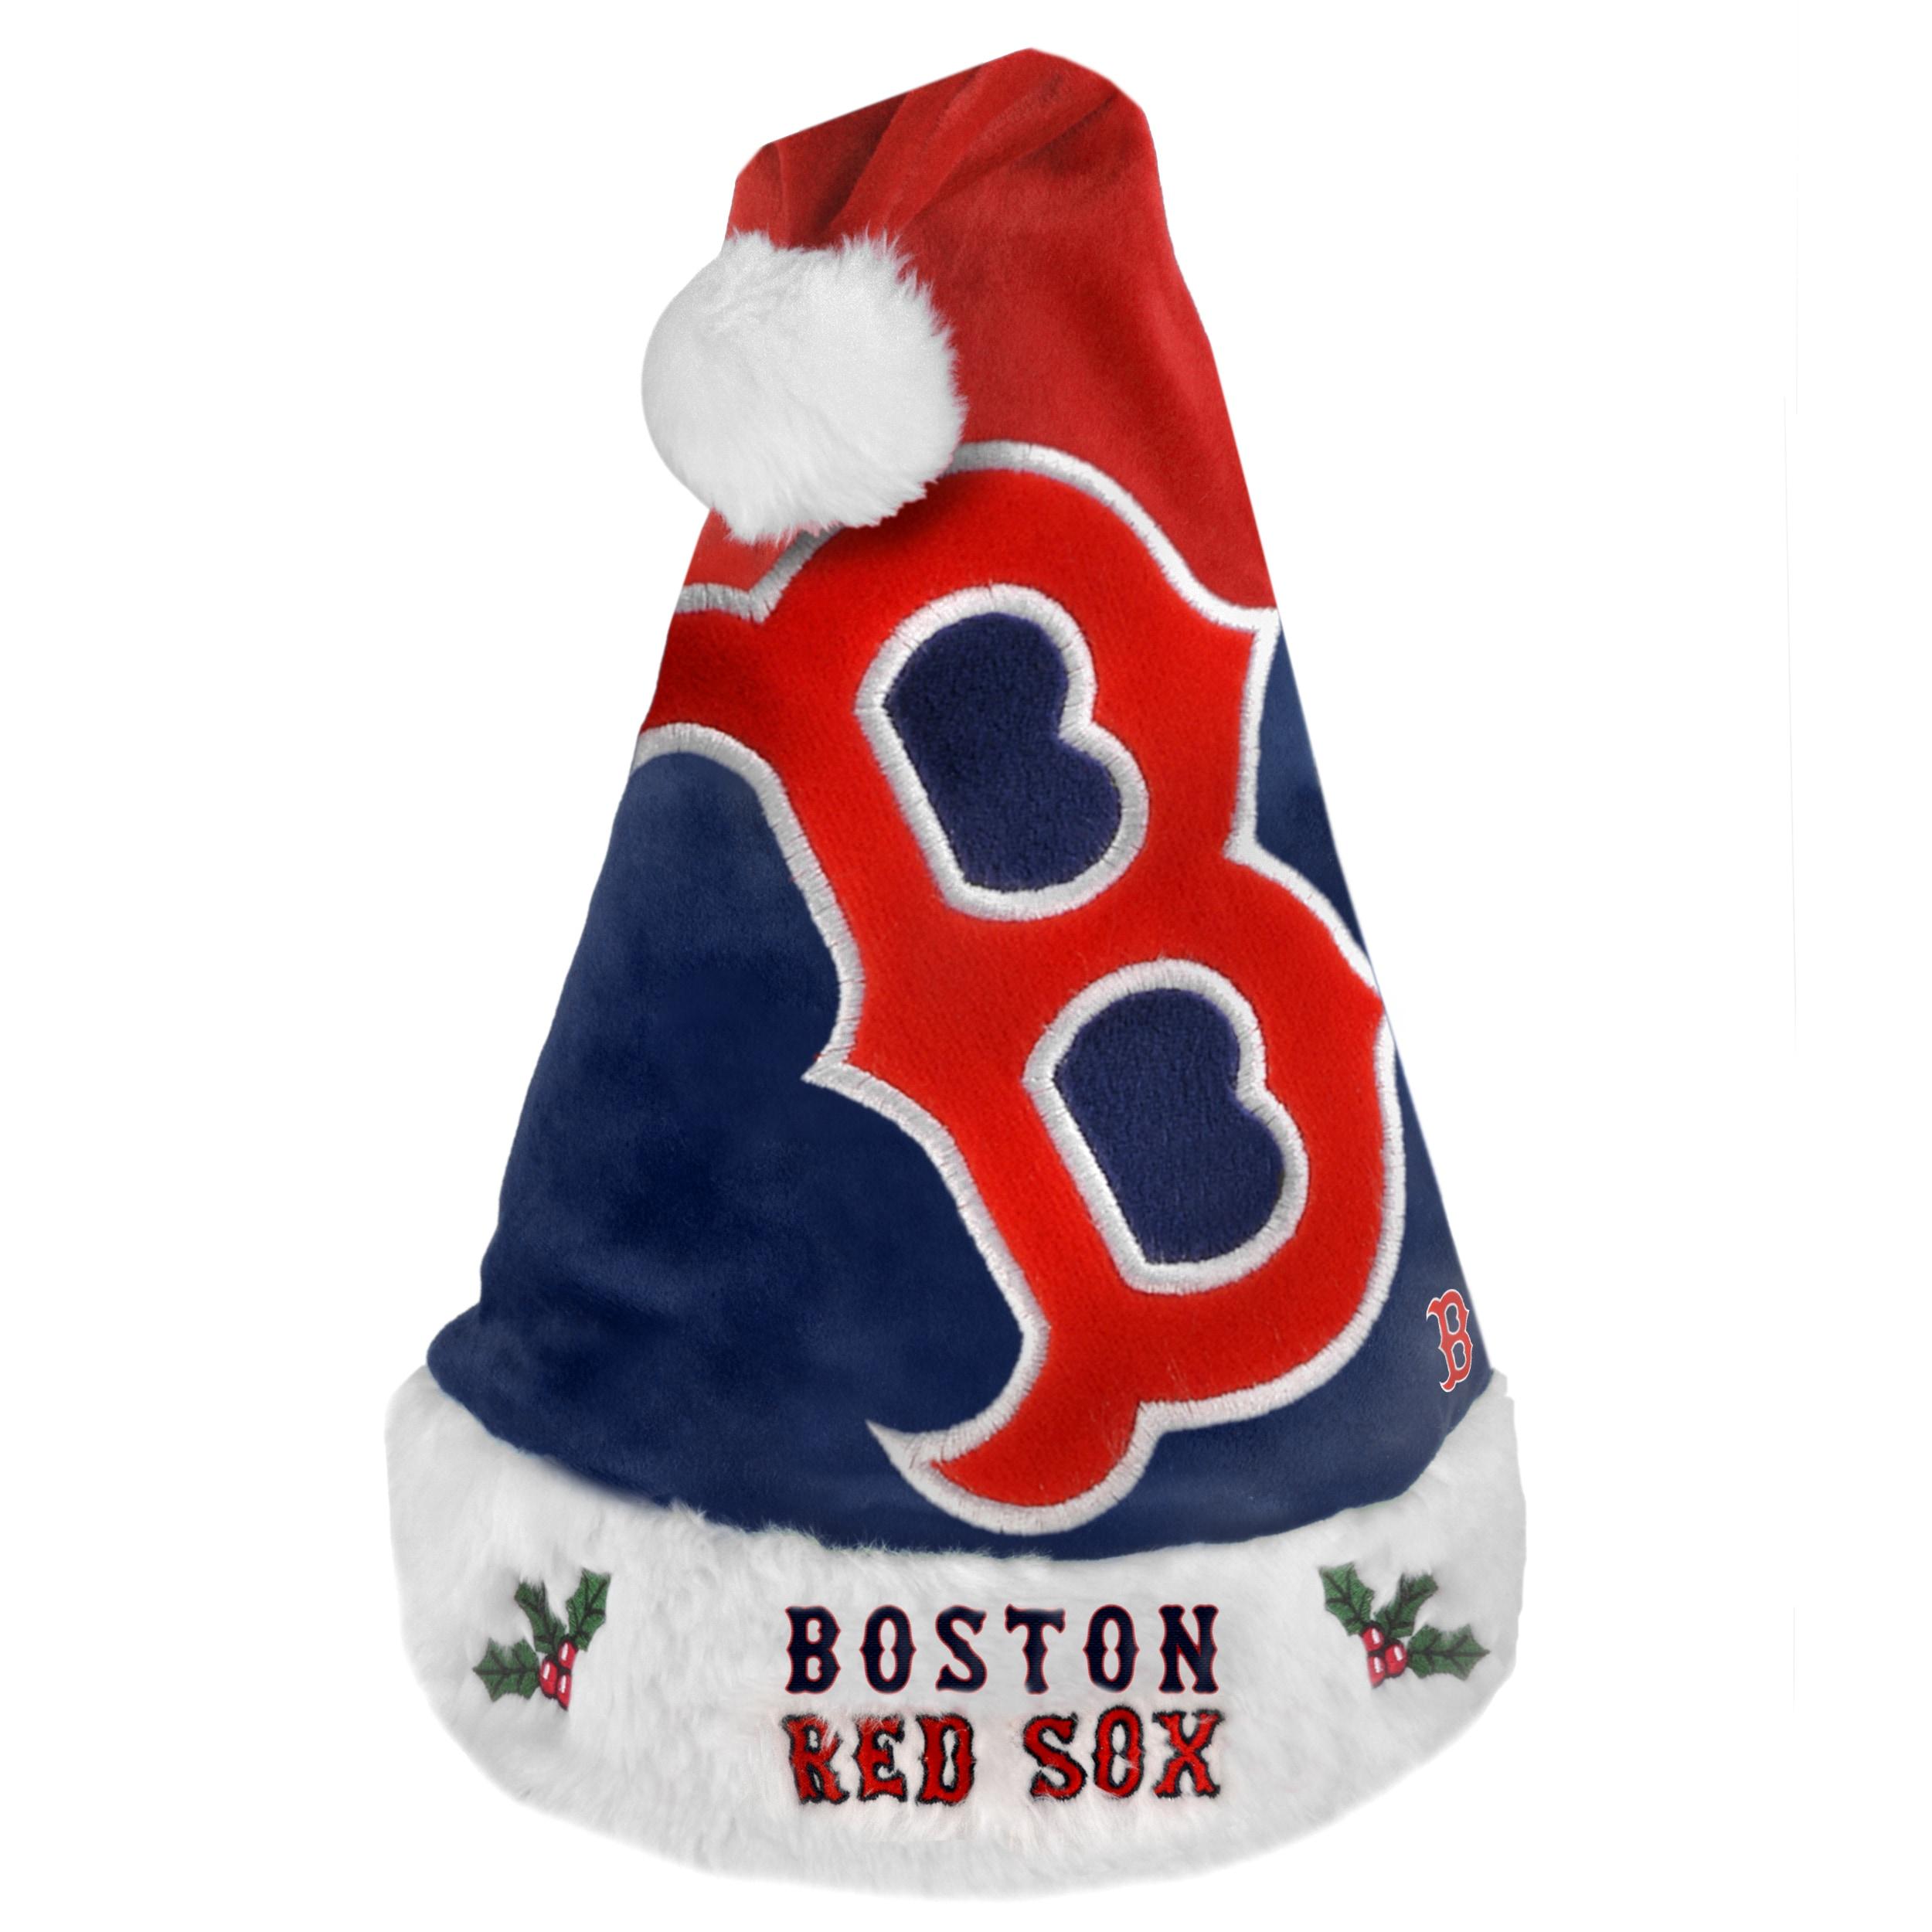 Boston Red Sox 2011 Colorblock Runoff Logo Santa Hat